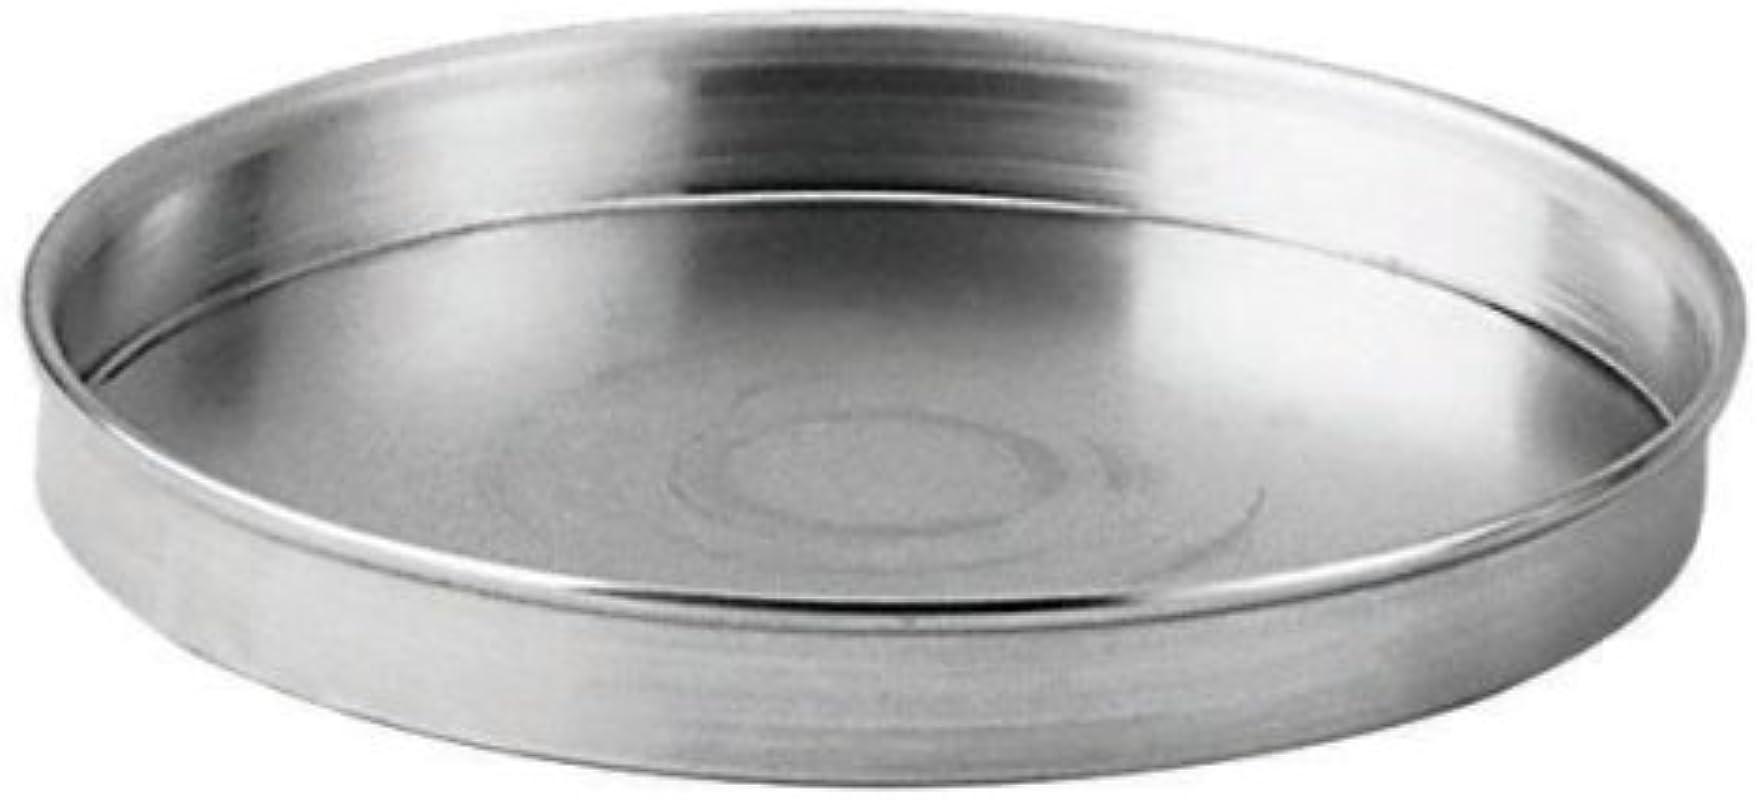 Johnson Rose 12 Inch X 1 Inch Aluminium Deep Dish Pizza Cake Pan